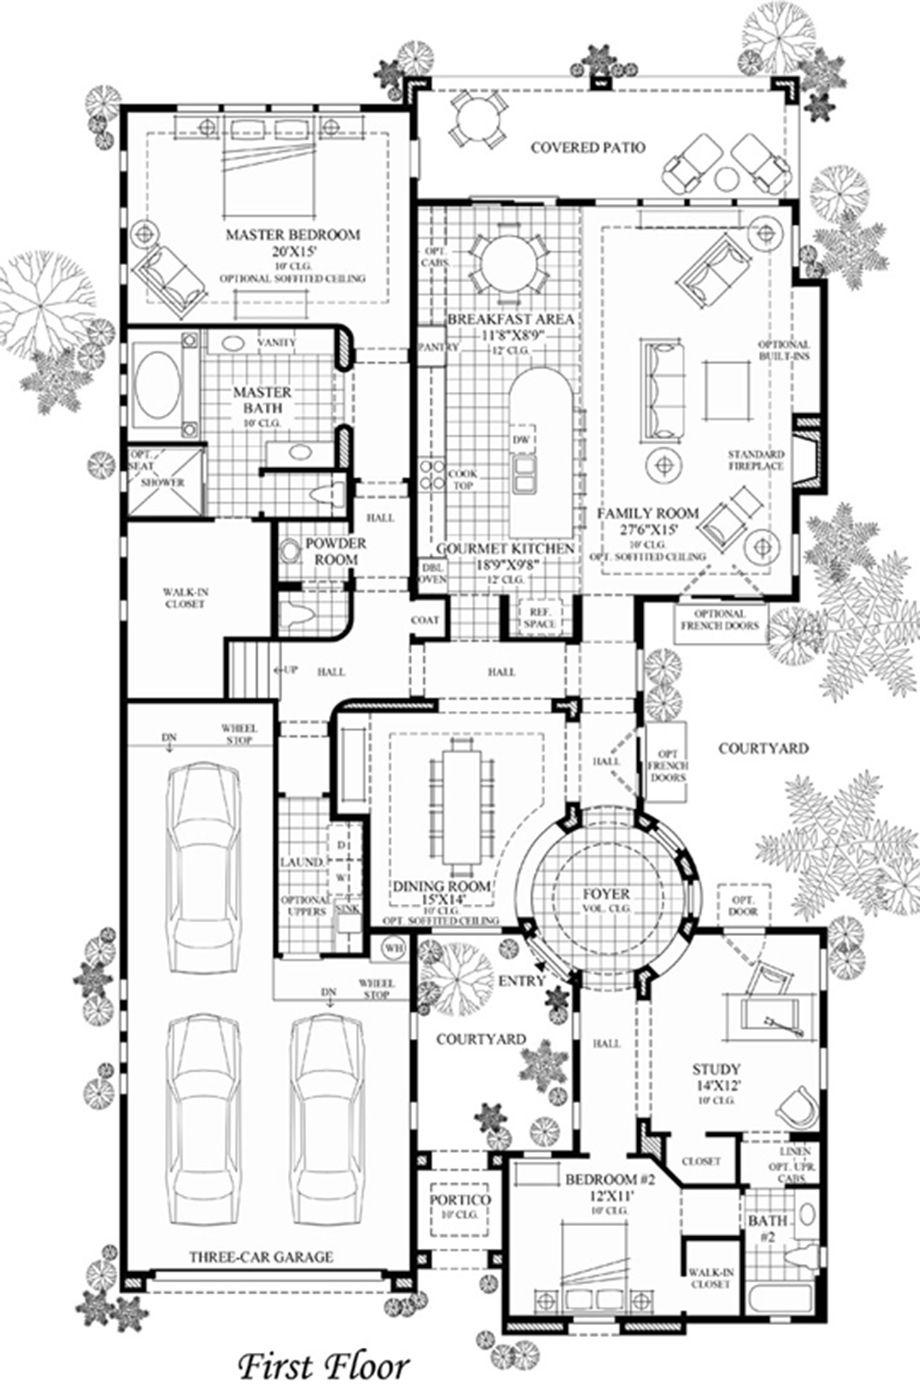 Sendero Floor Plan Home Design Floor Plans Home Building Design Mountain House Plans